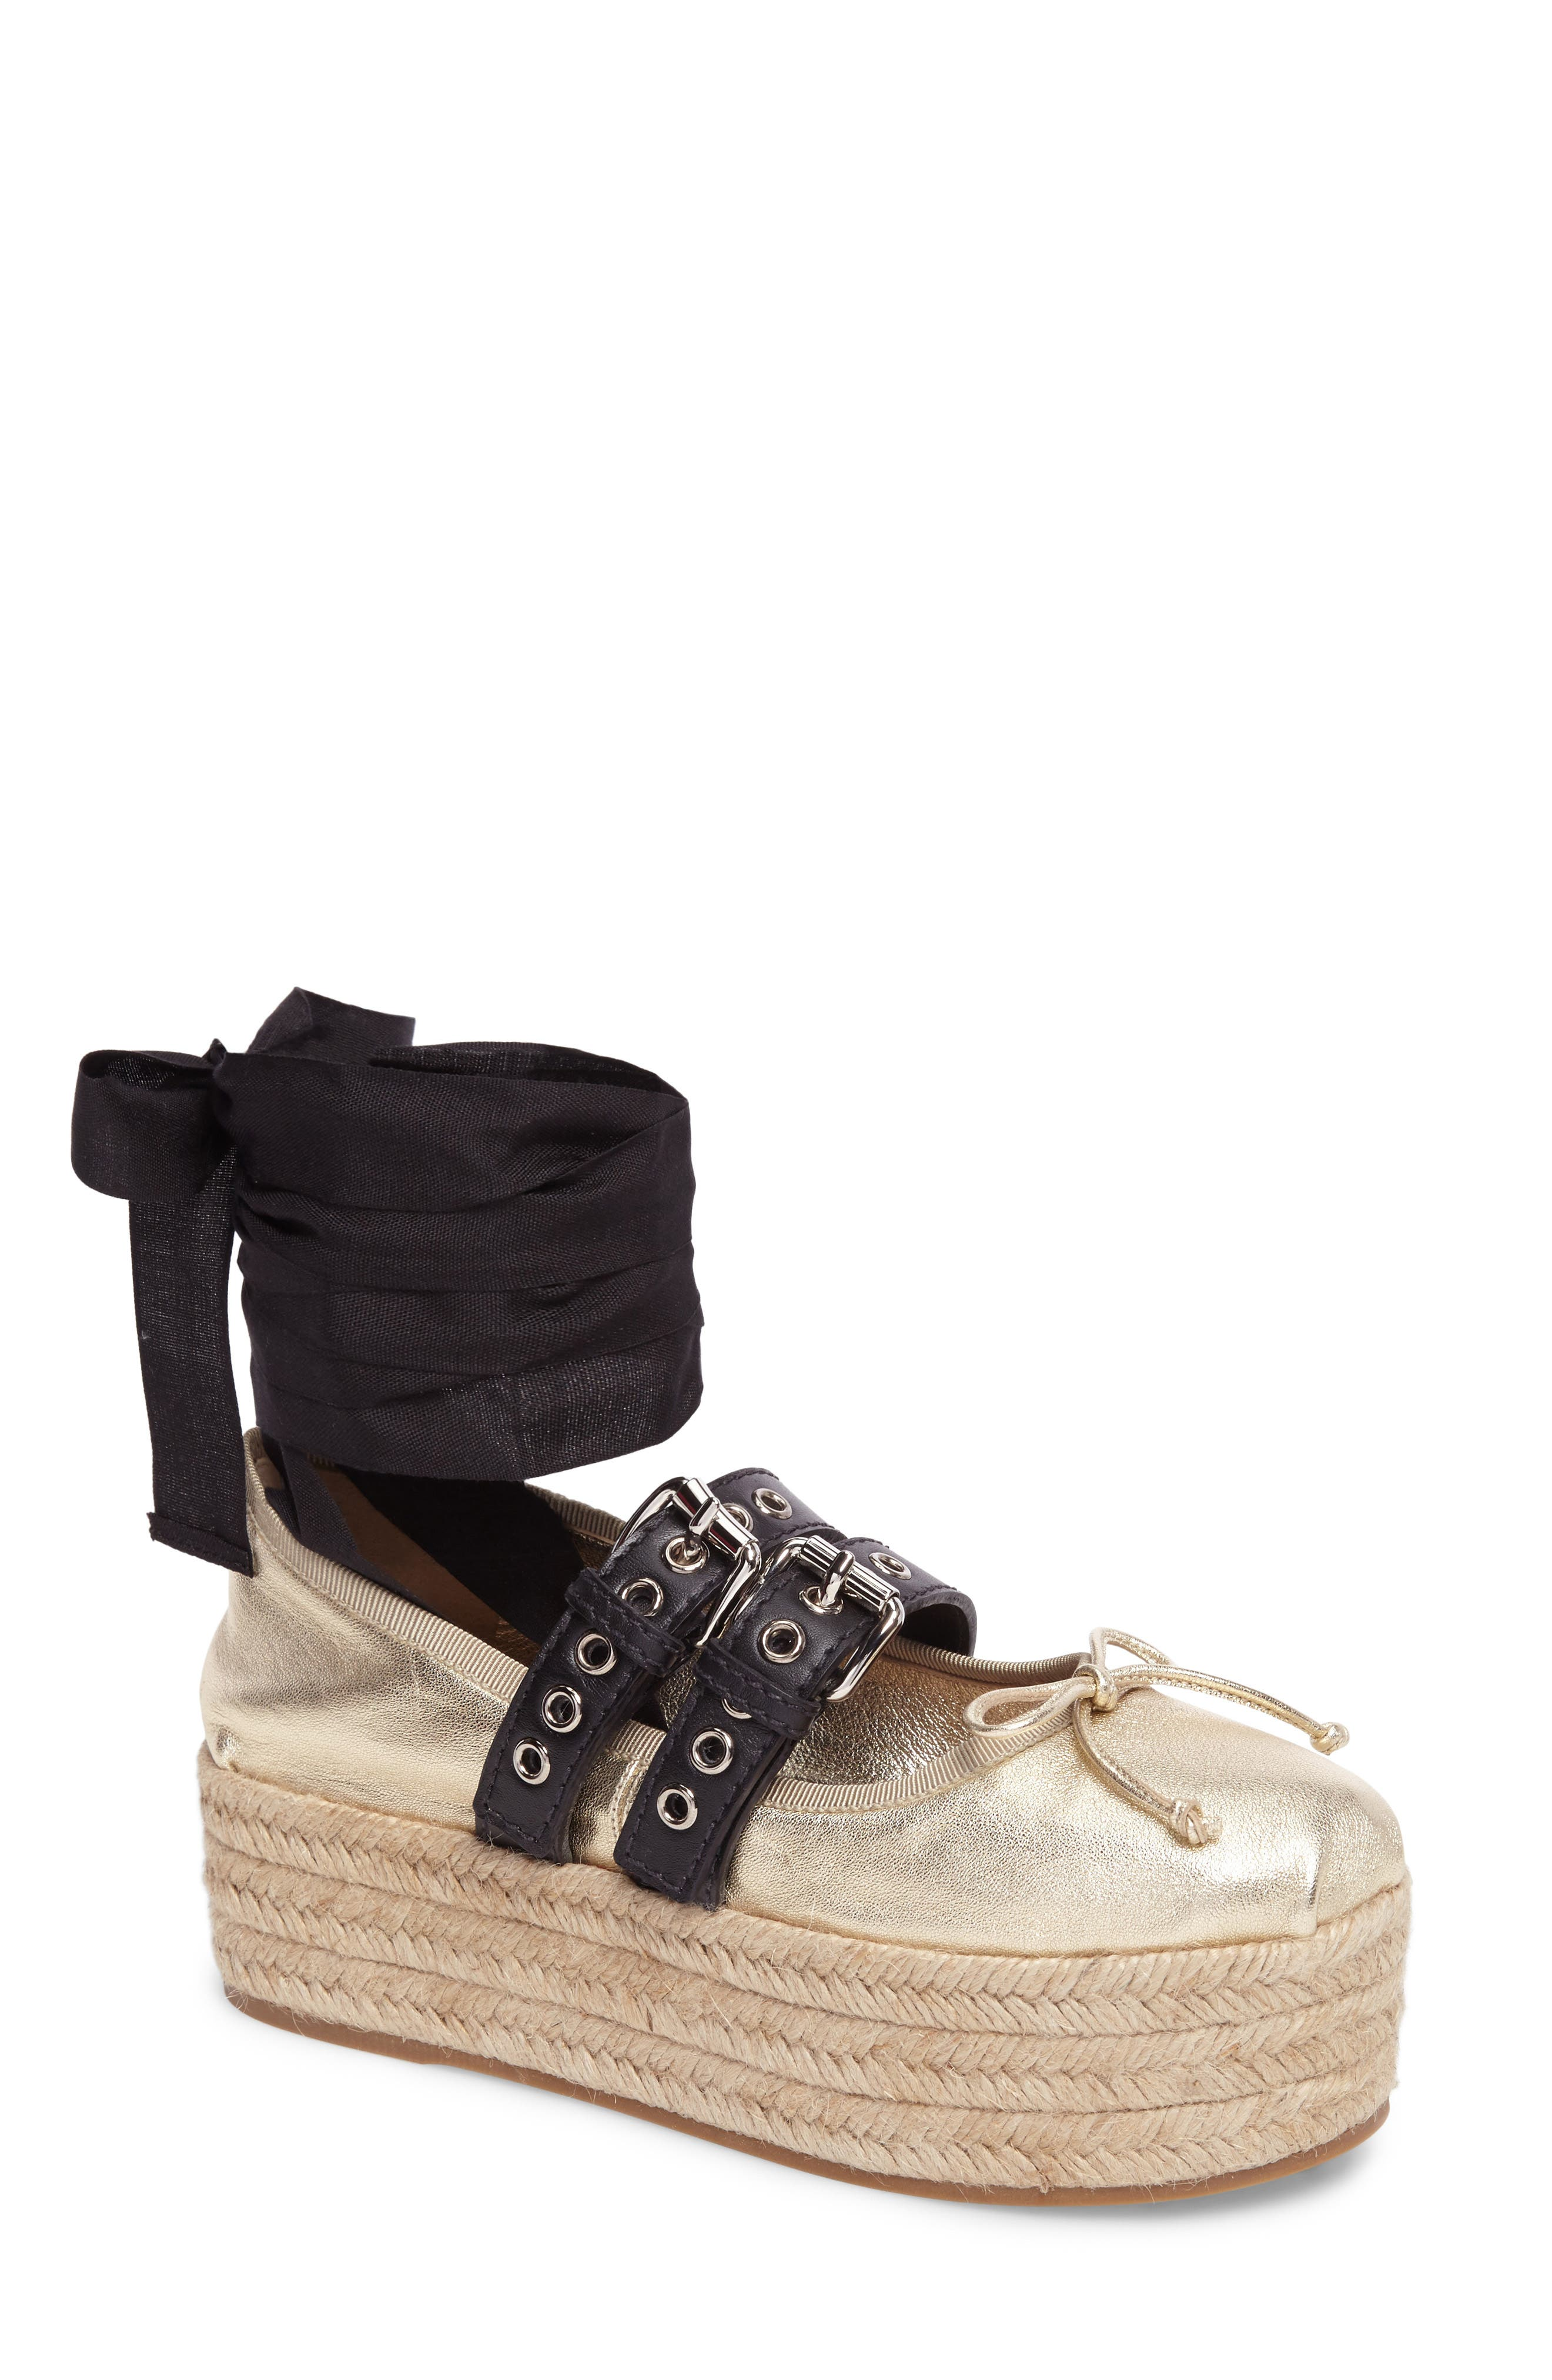 Main Image - Miu Miu Ankle Wrap Platform Espadrille (Women)